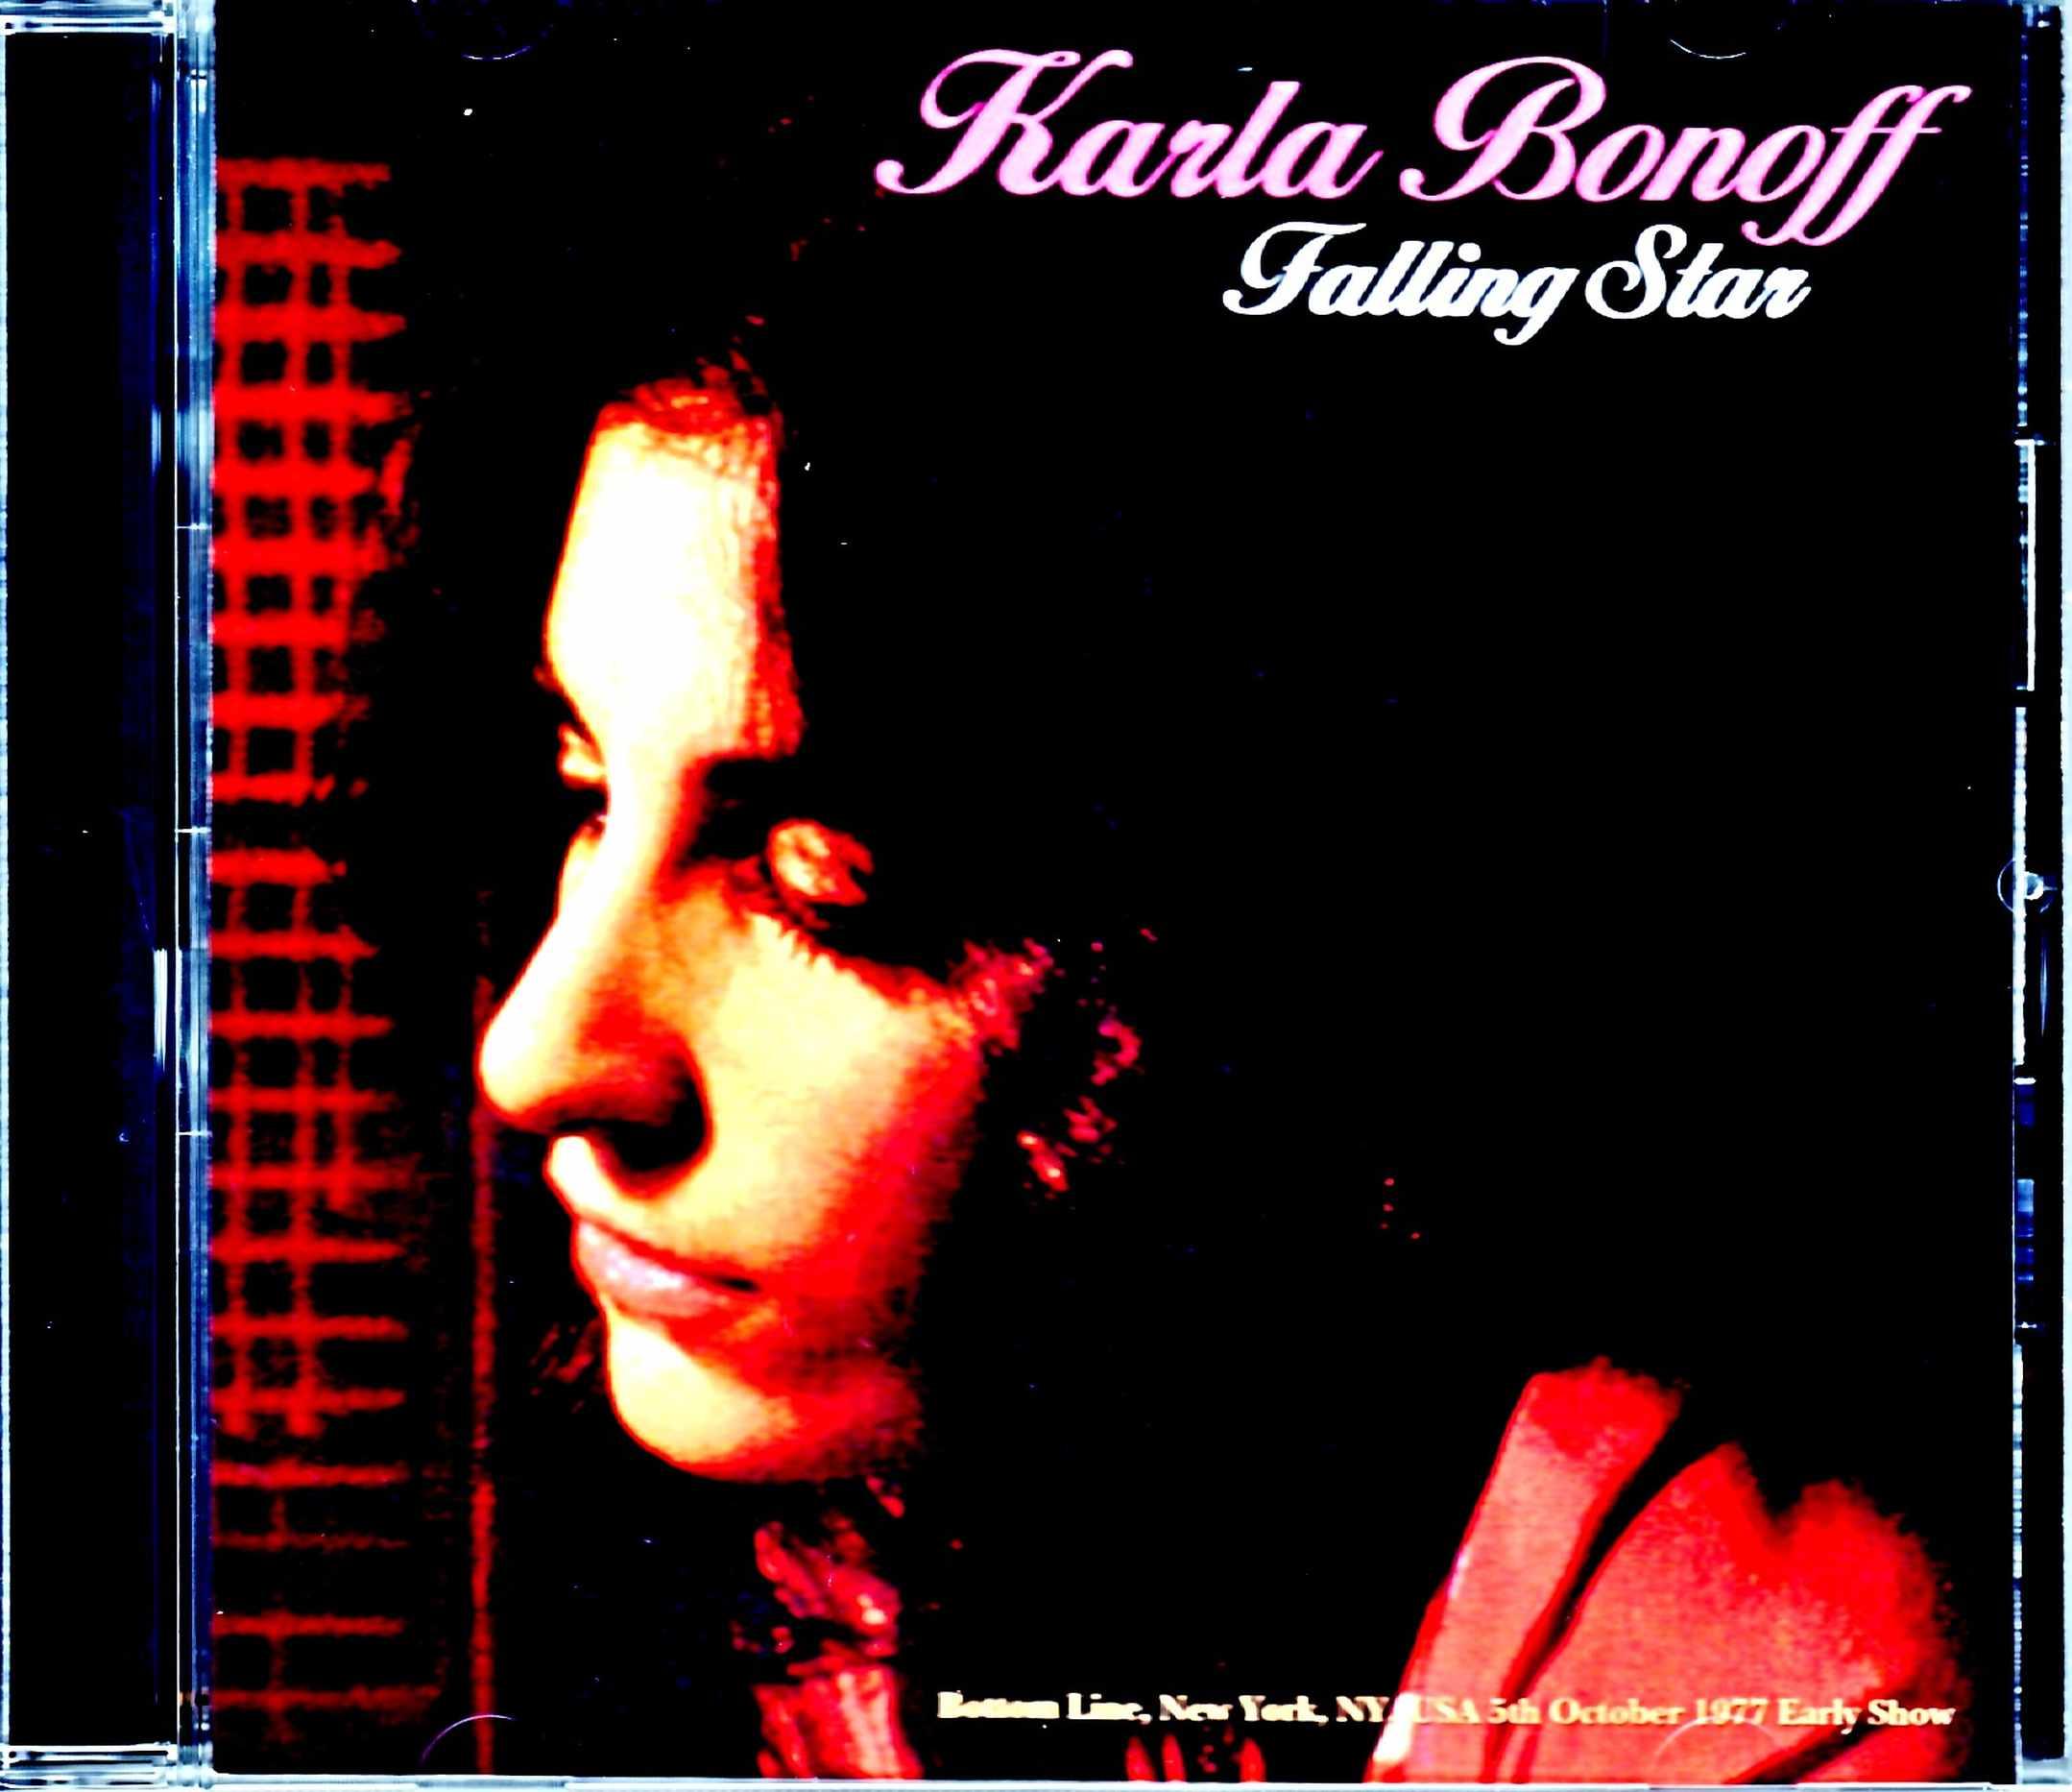 Karla Bonoff カーラ・ボノフ/NY,USA 1977 Early Show Complete